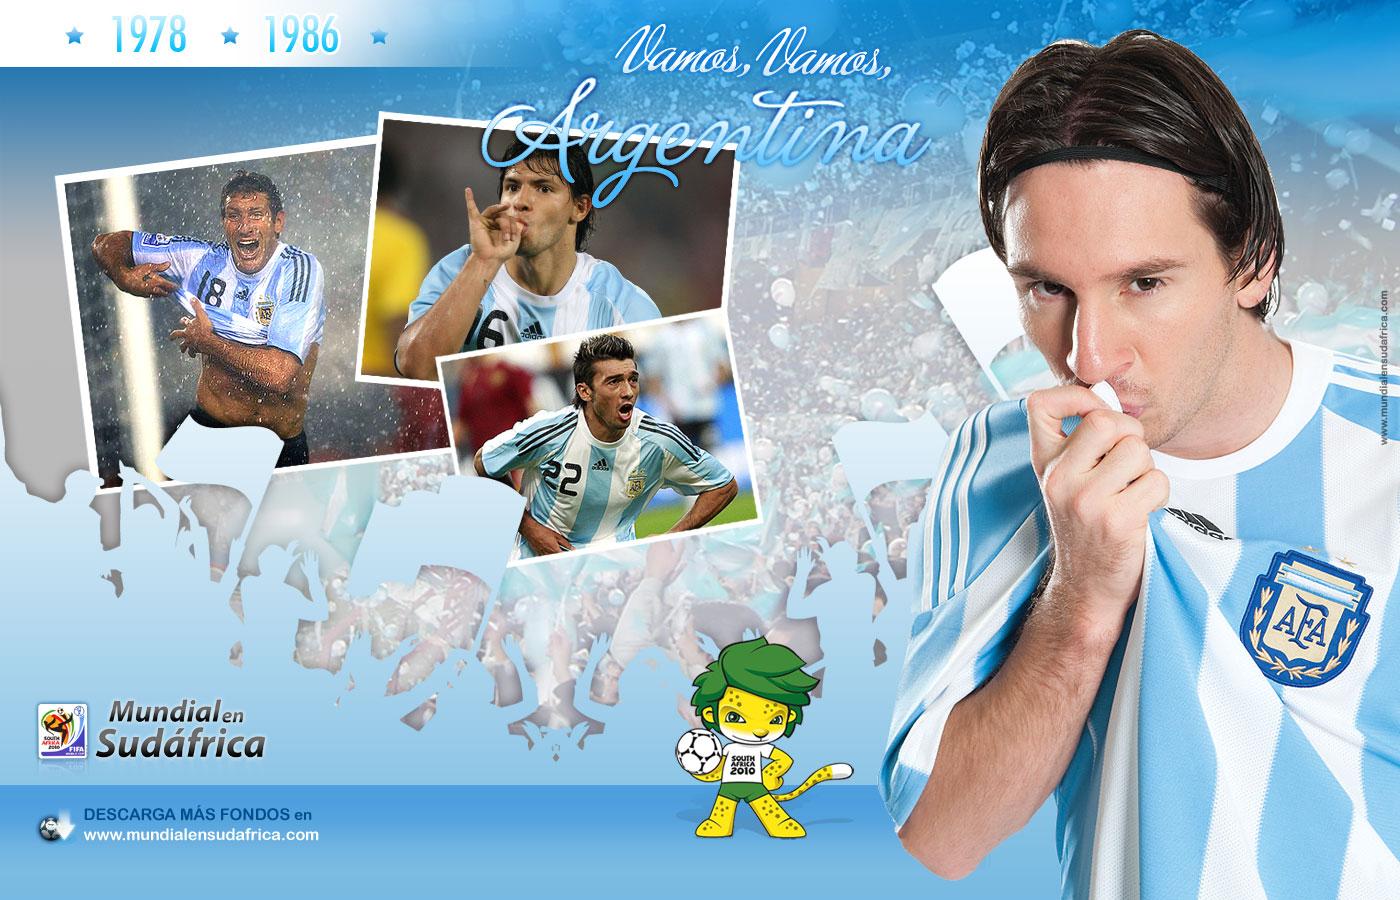 http://1.bp.blogspot.com/_Fn_r8TT3a_k/S-oUZ5aBKlI/AAAAAAAABxo/TDkVkwuF9sw/s1600/Jugador_Messi_Argentina.jpg